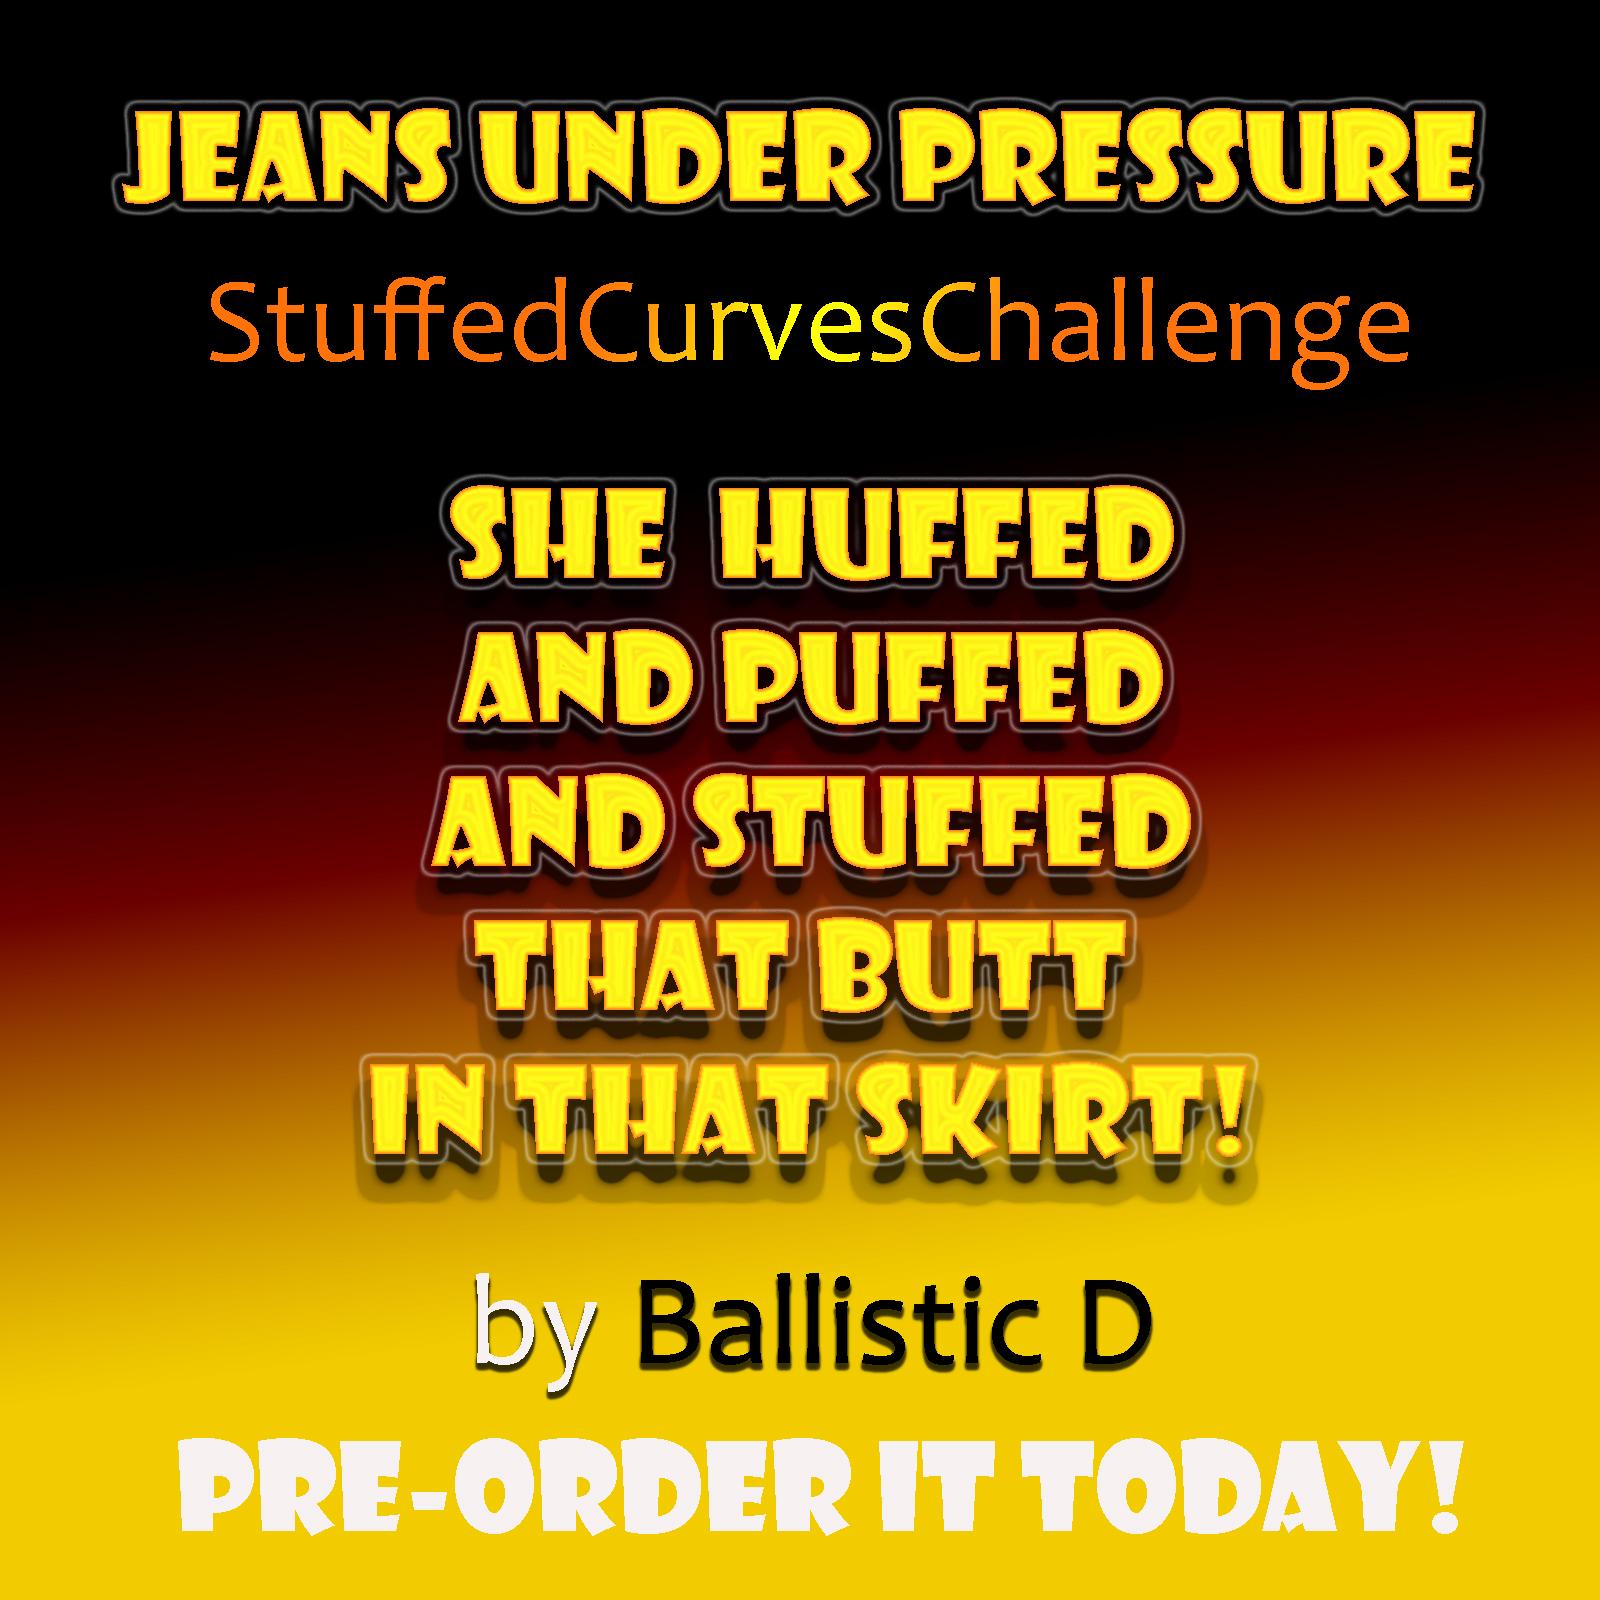 Jeans Under Pressure Song -PreOrder